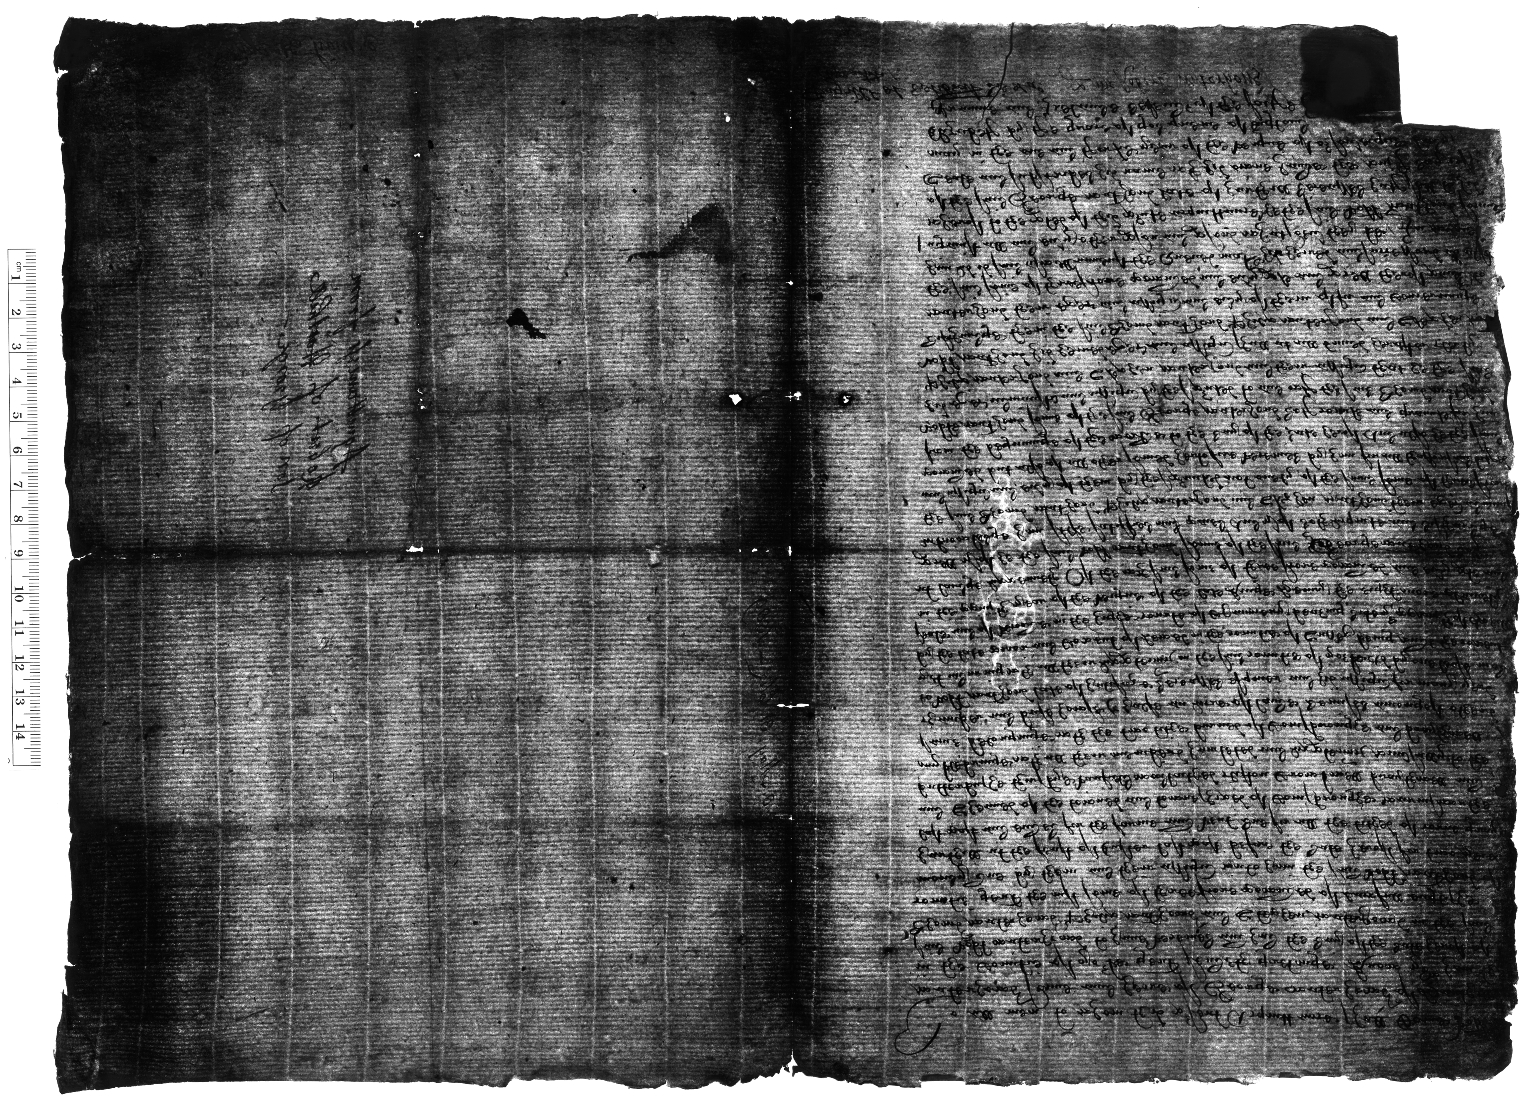 Acquittance from Robert Waterhouse of Harthill, Yorkshire, to Thomas Waterhouse, Philip Waterhouse, and Stephen Waterhouse of Harthill